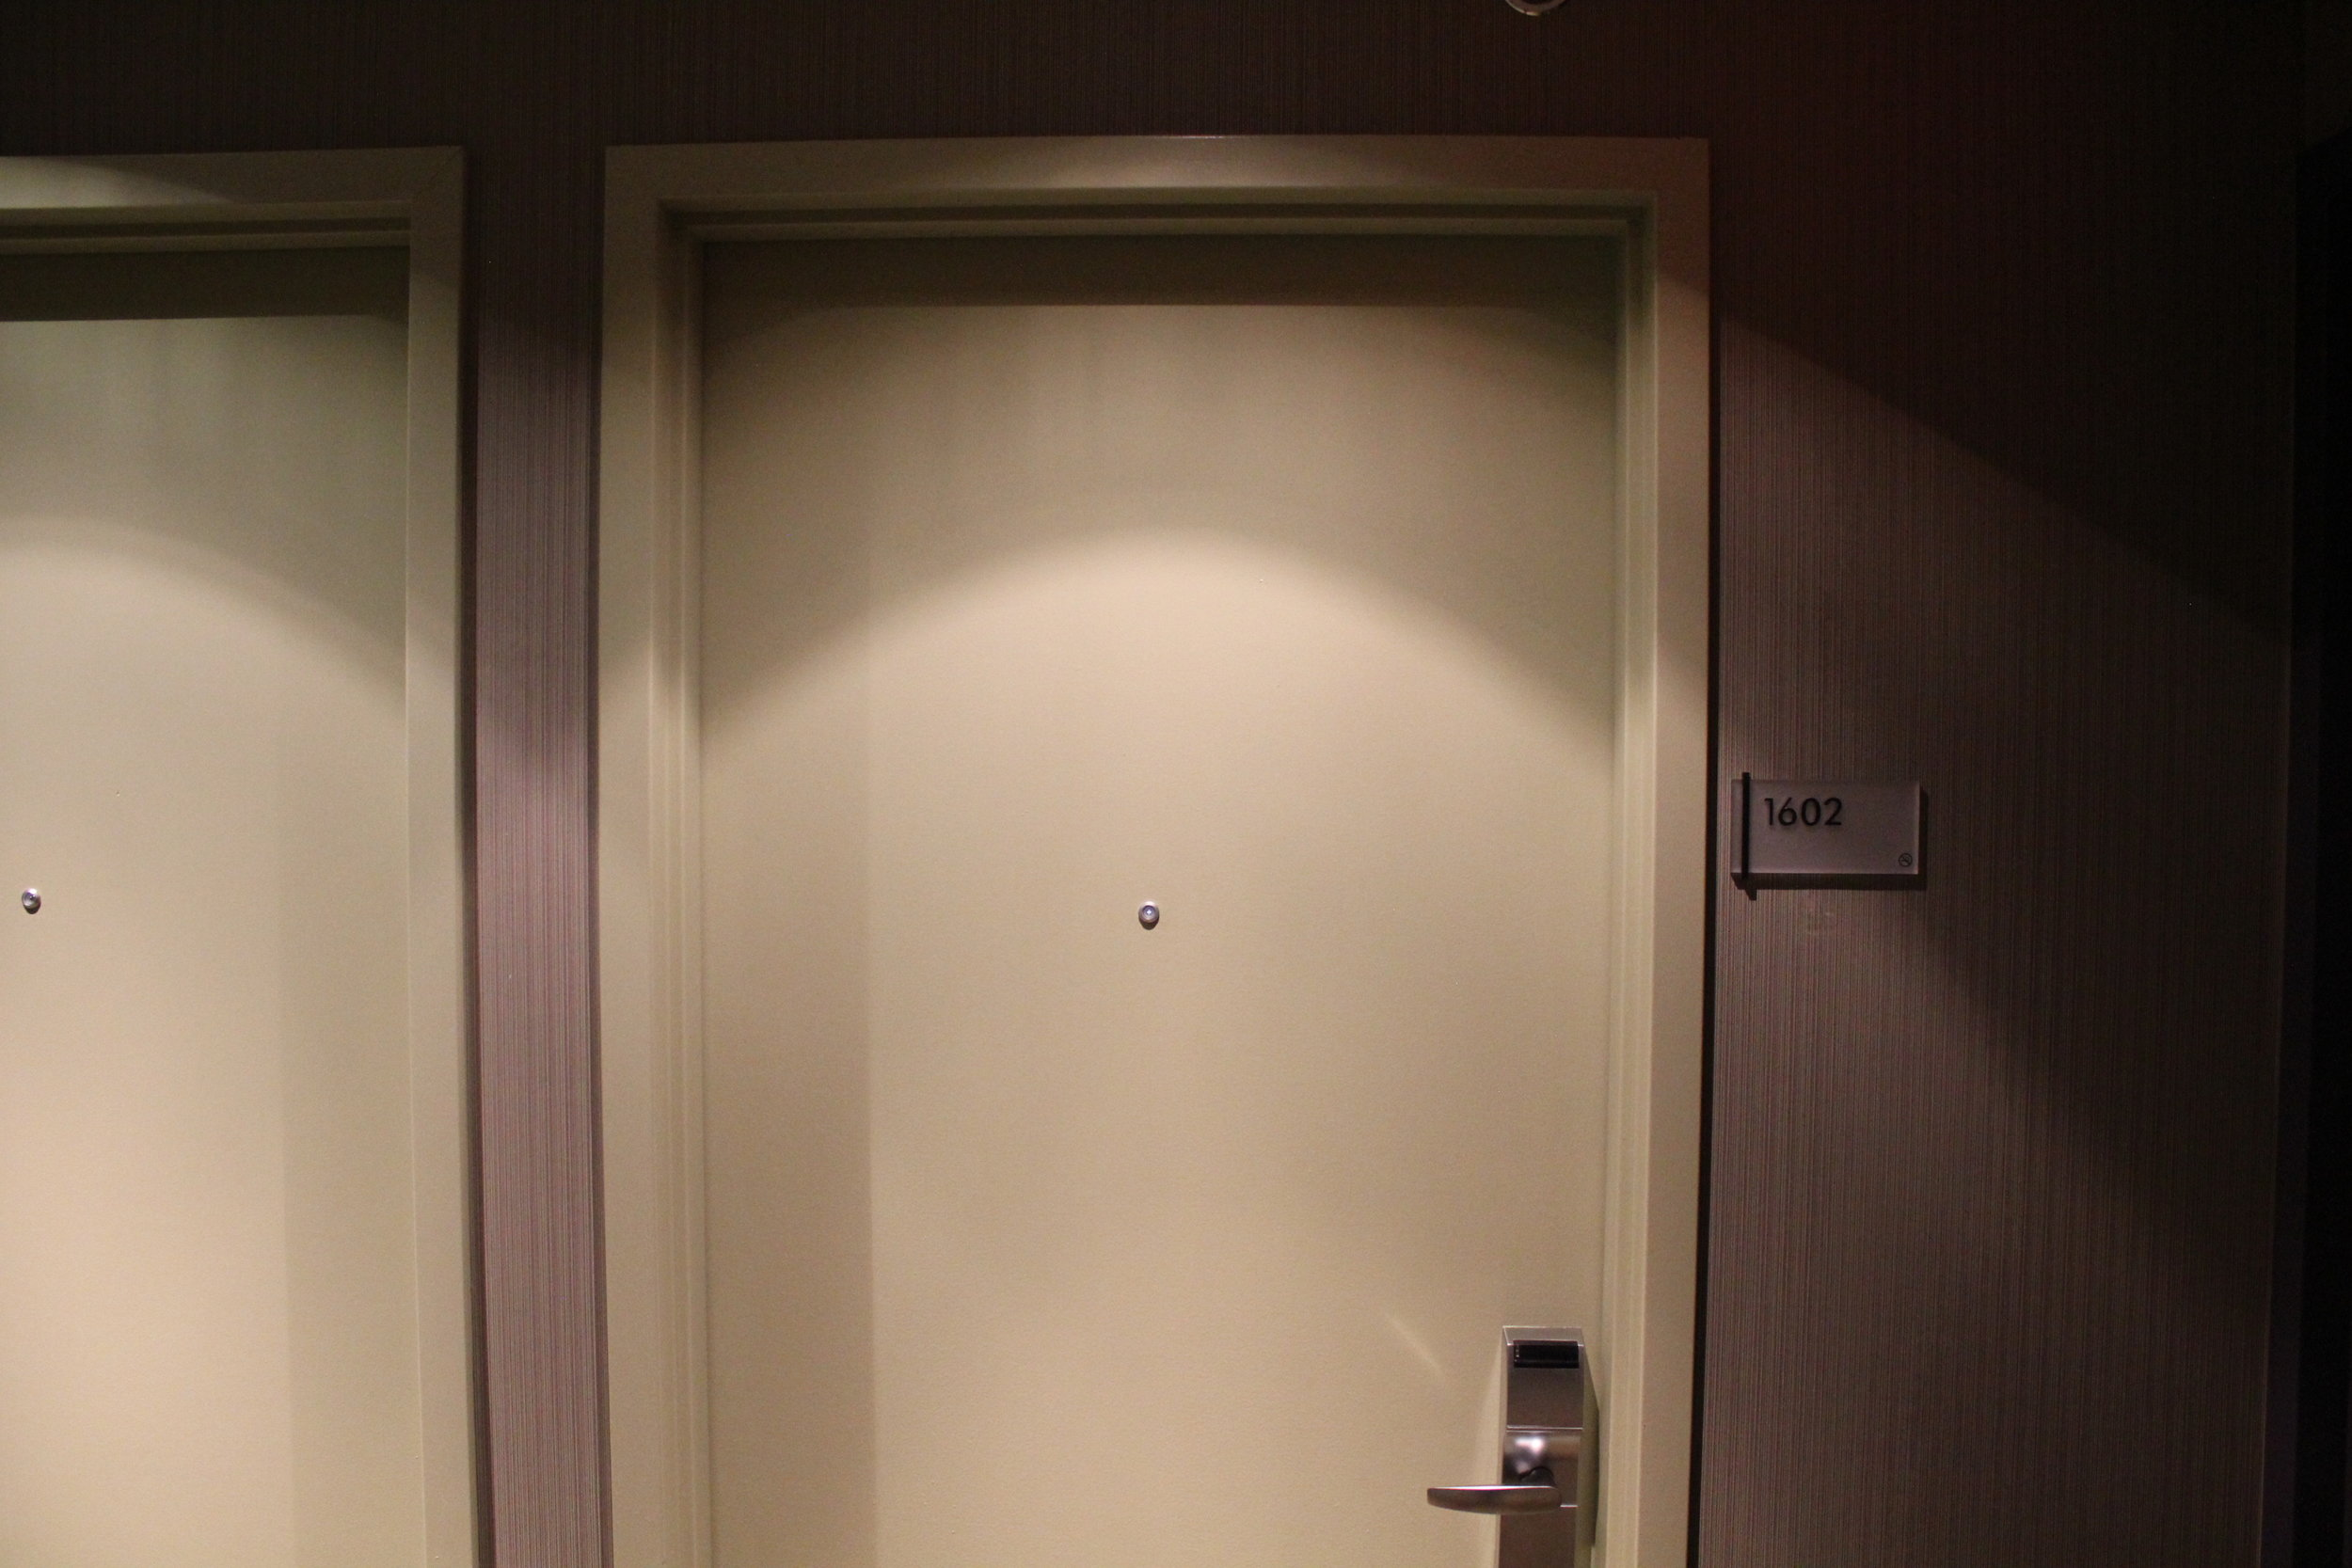 Best Western Premier New York Herald Square – Room 1602